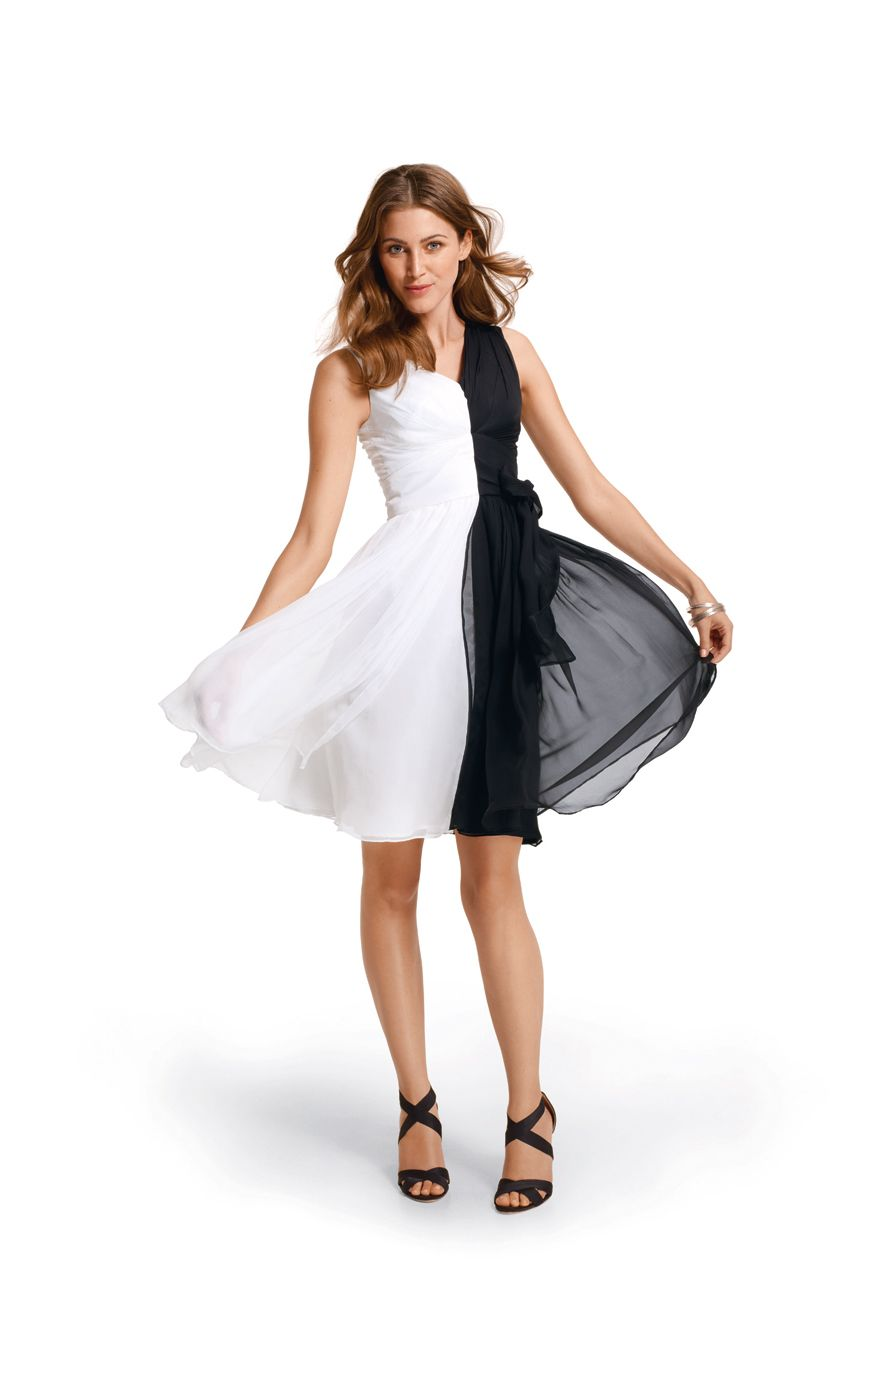 0ba92b88586 Dress in  black and  white  nivea